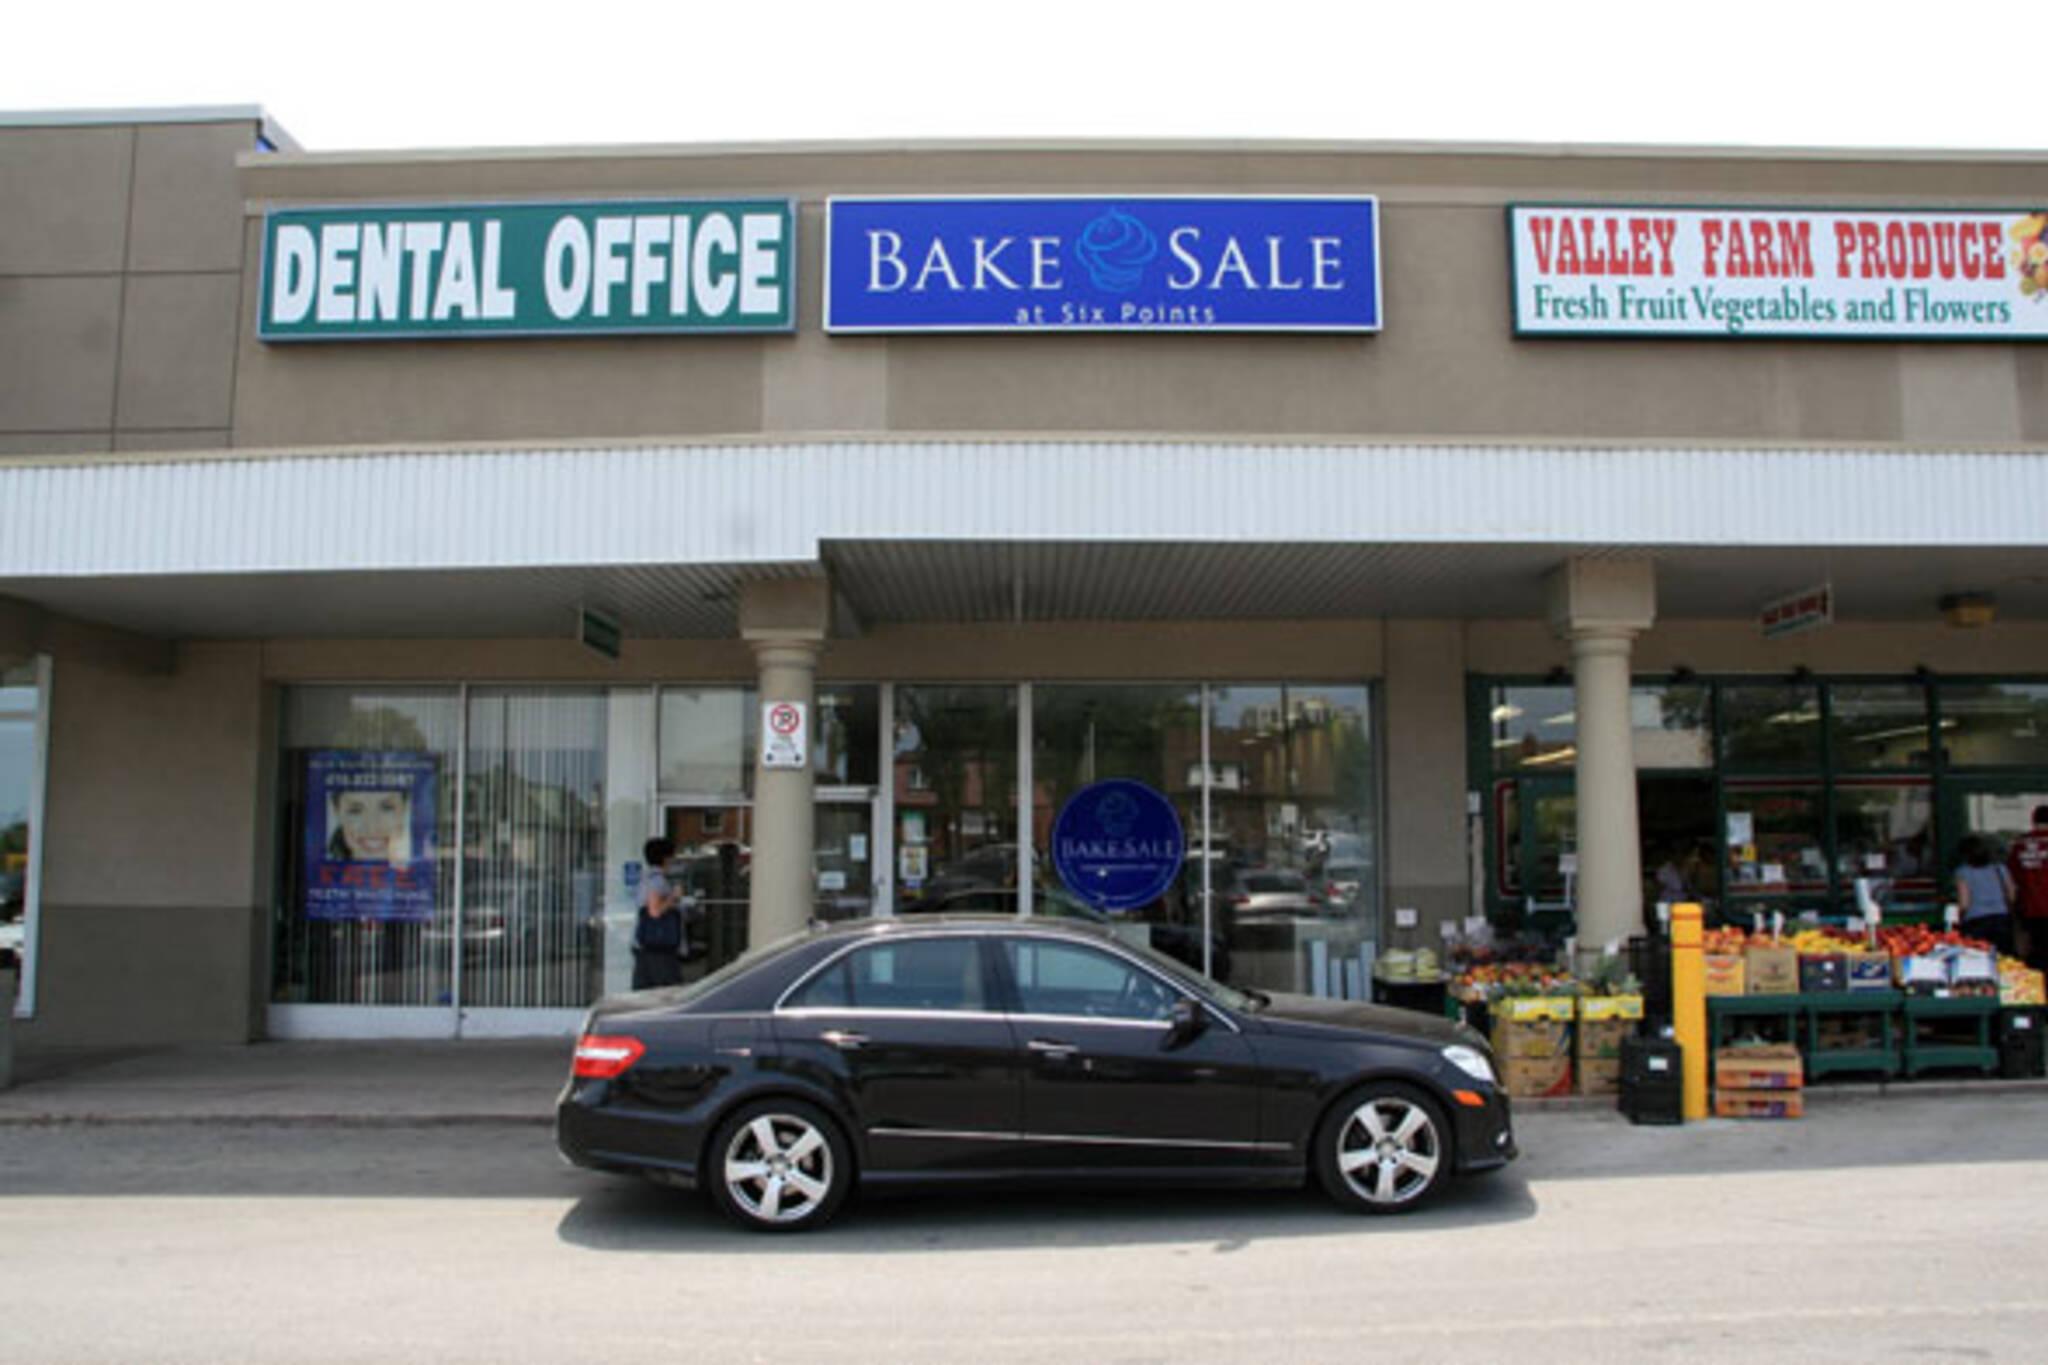 Bake Sale 6 Points